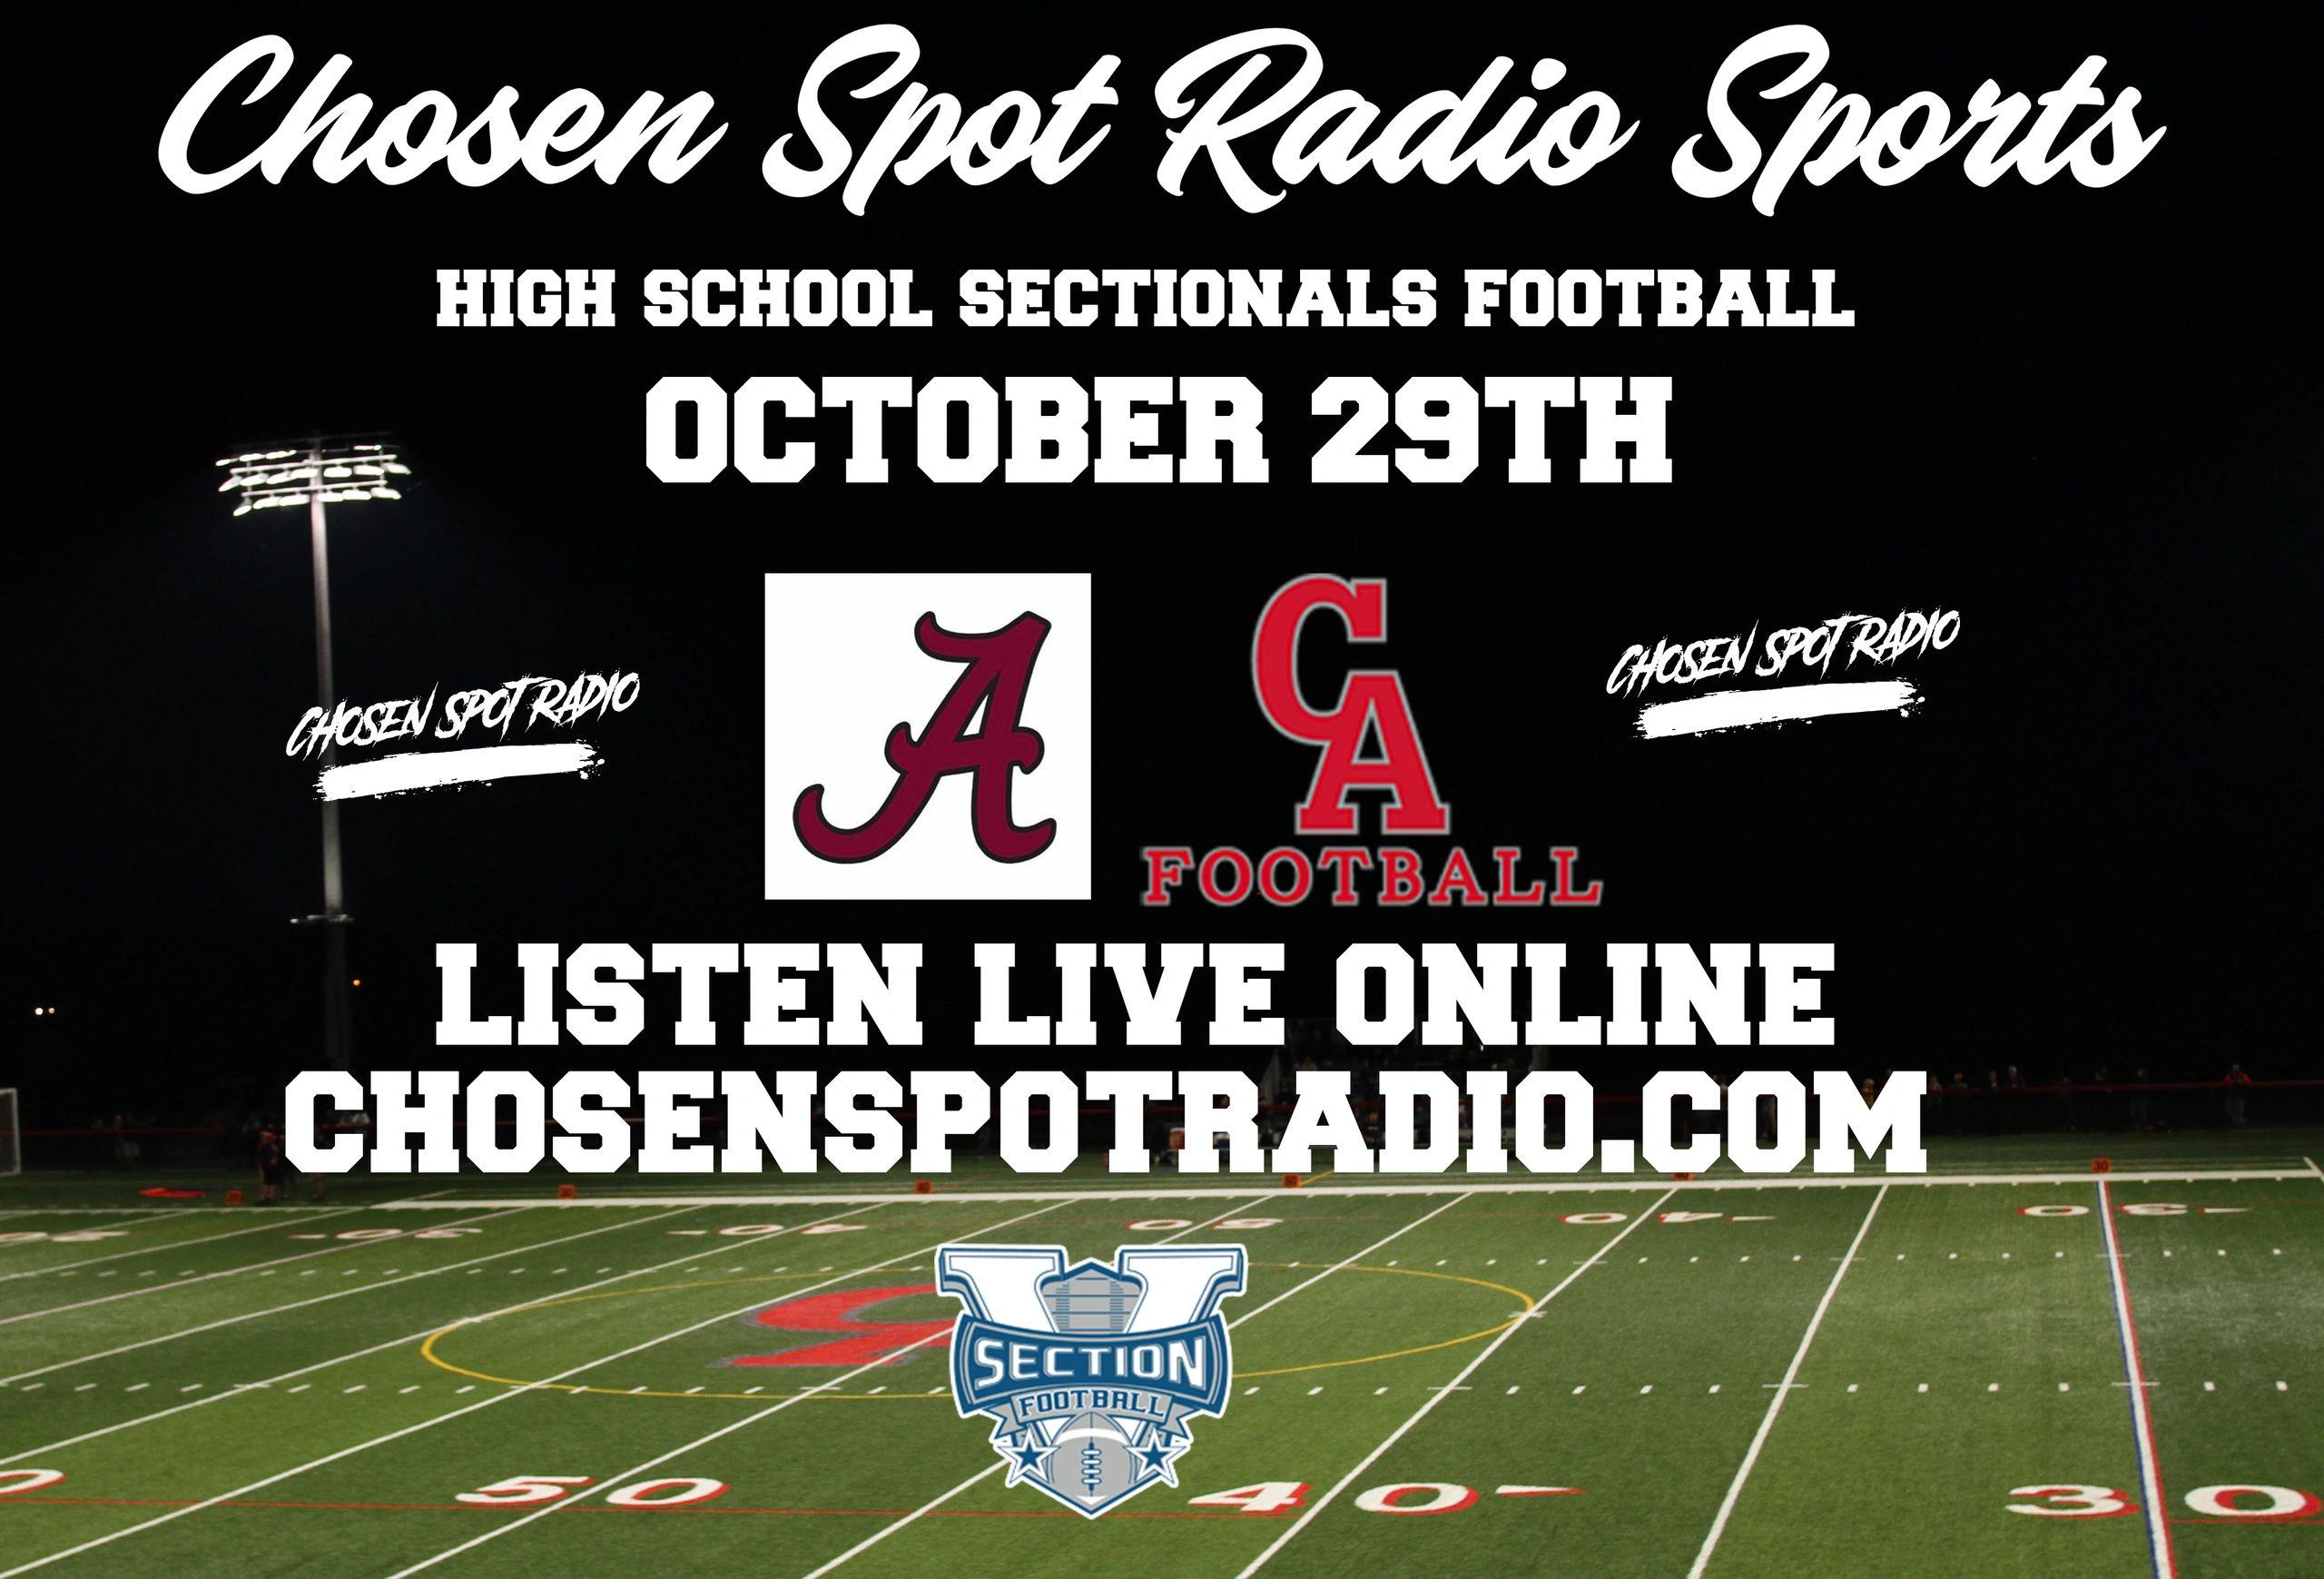 Chosen Spot Radio